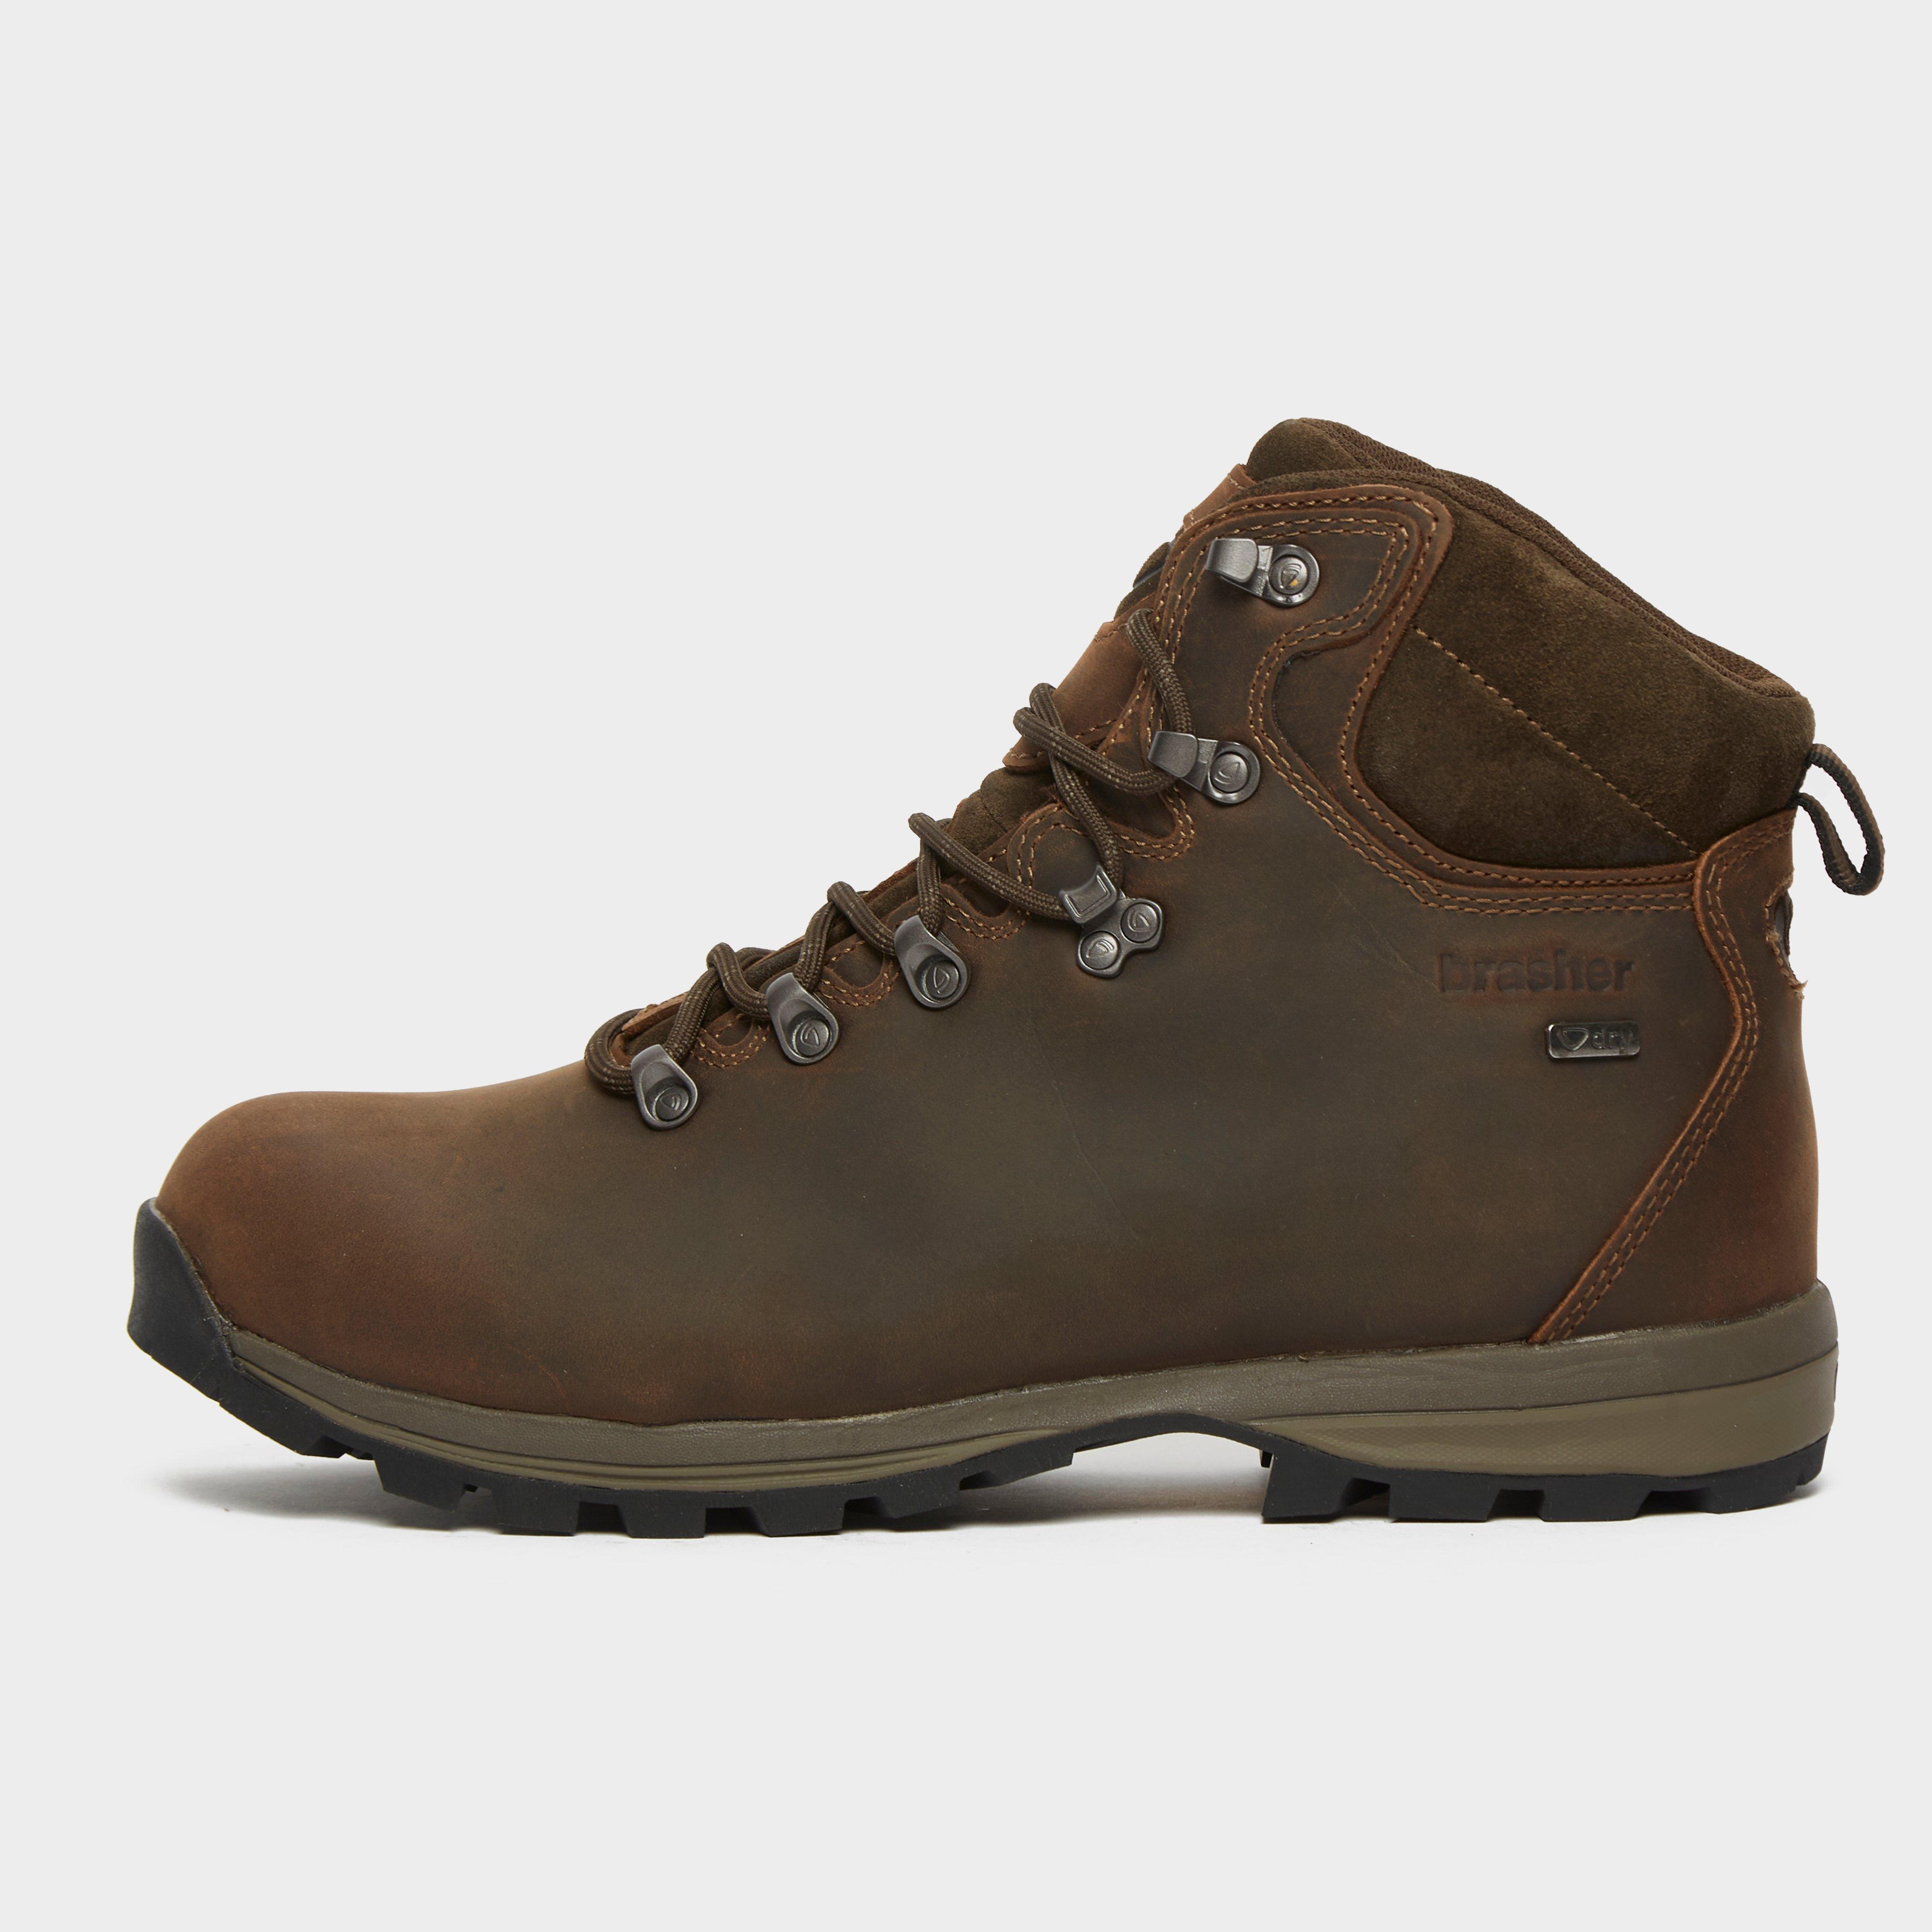 Brasher Brasher Mens Country Walker Walking Boots - Brown, Brown